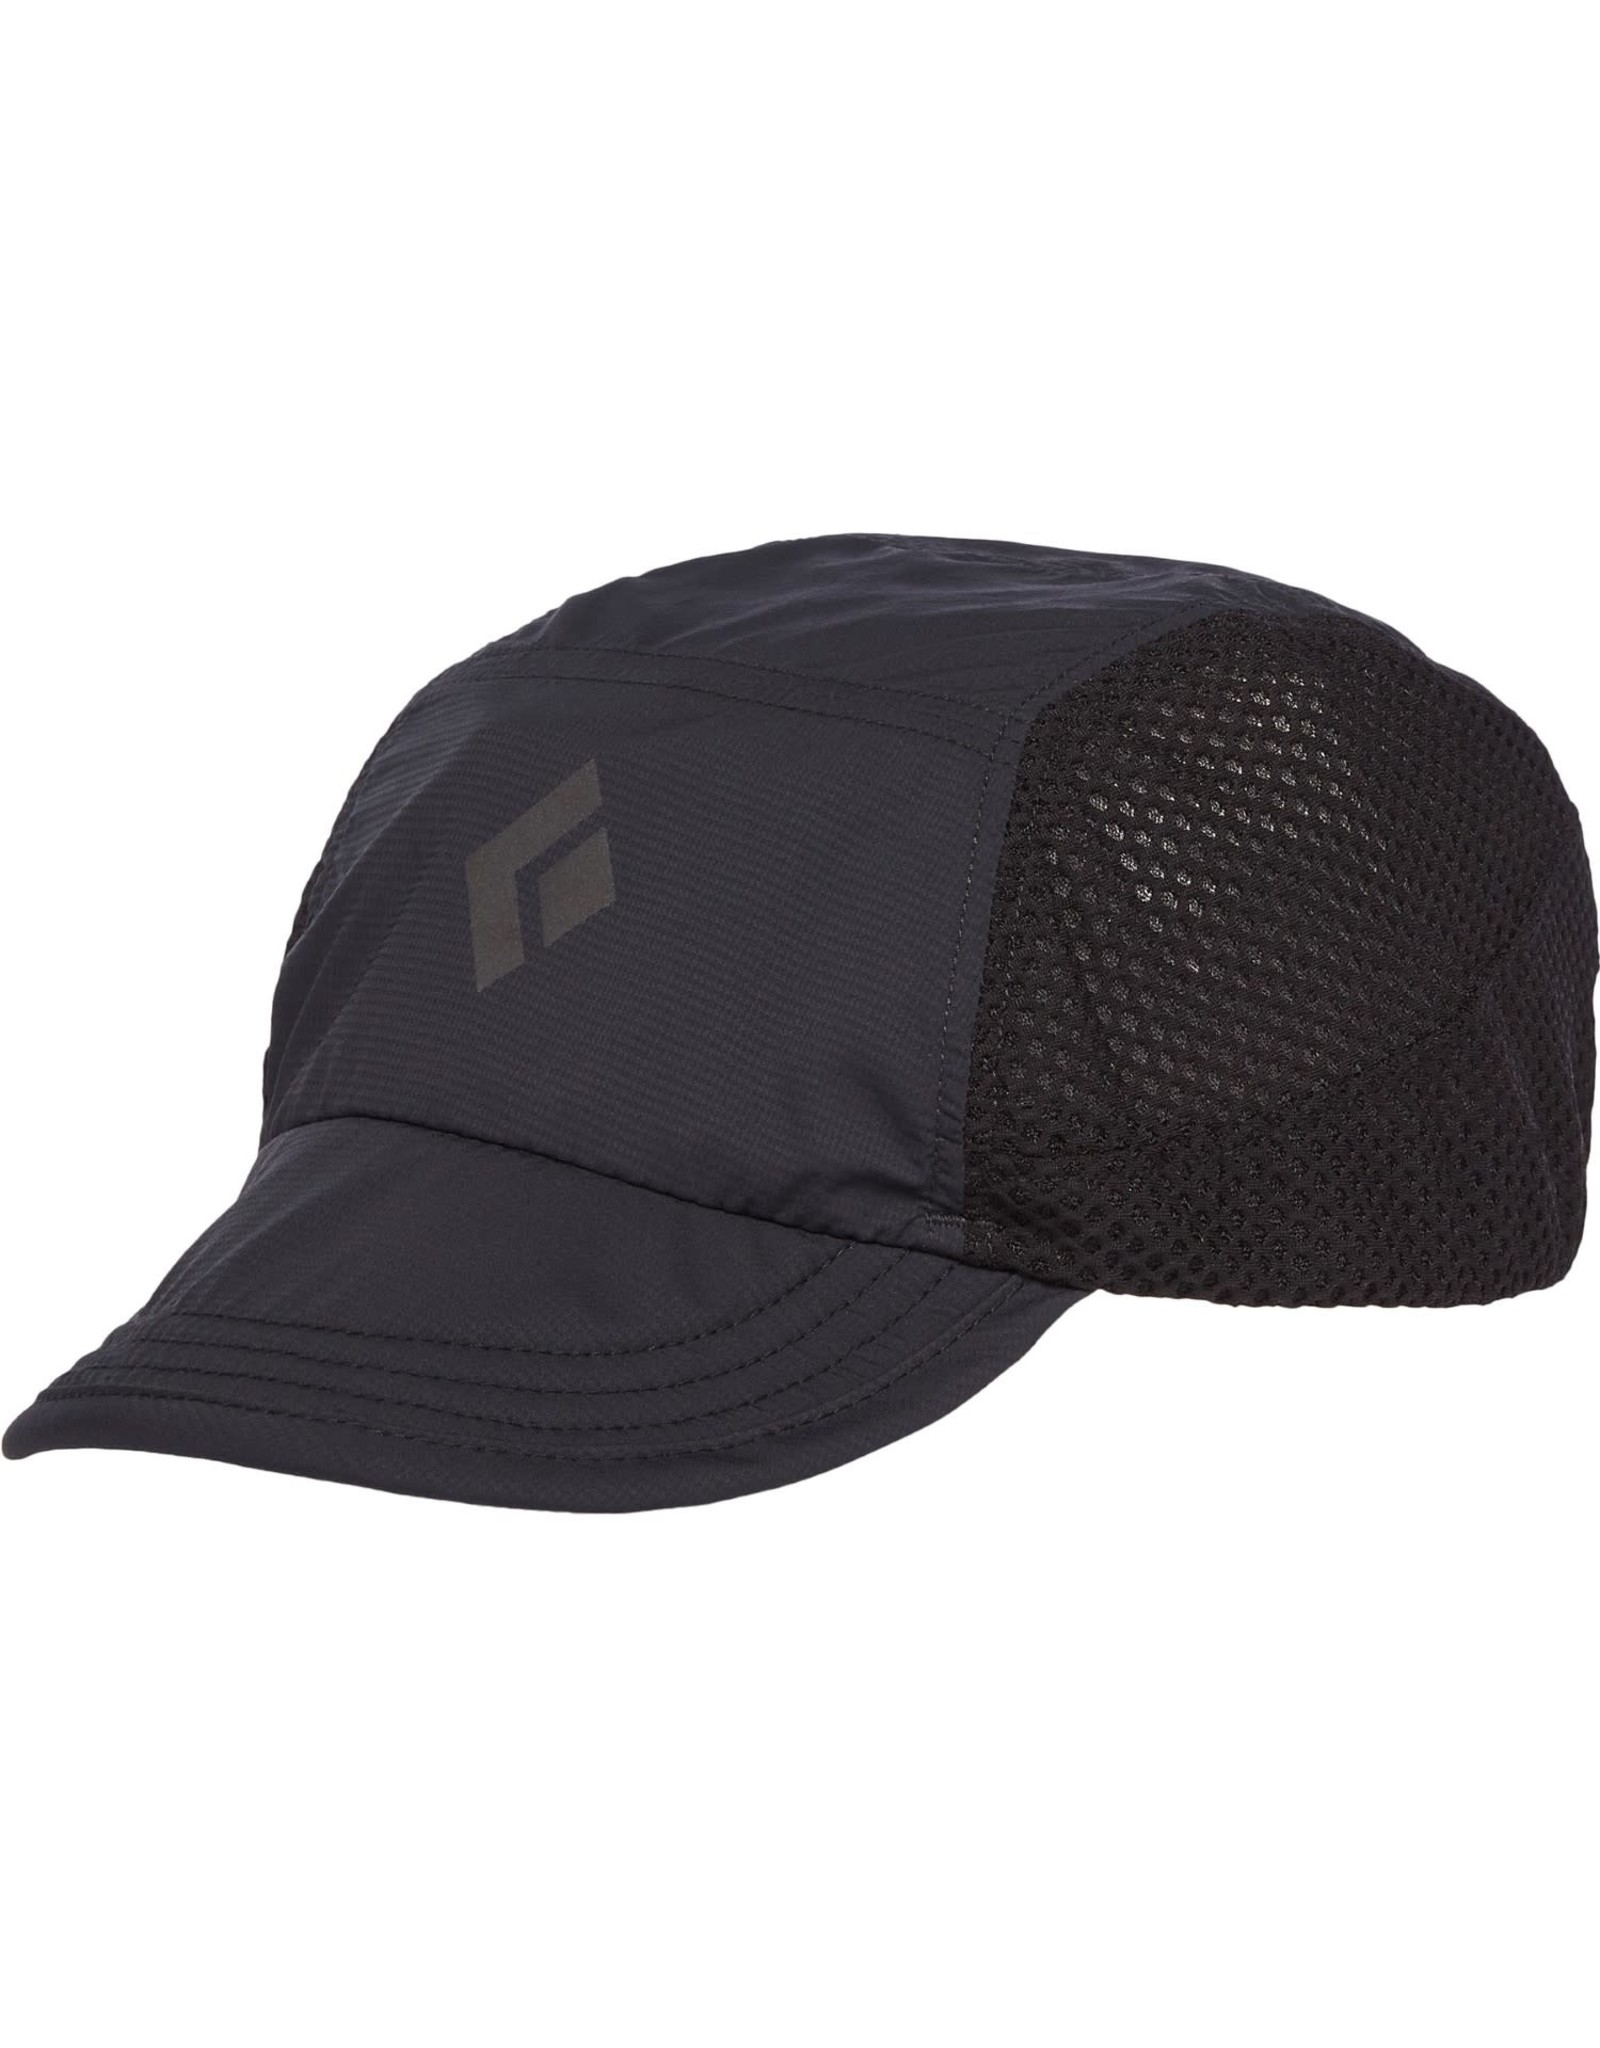 Black Diamond Black Diamond Distance Hat - Unisex